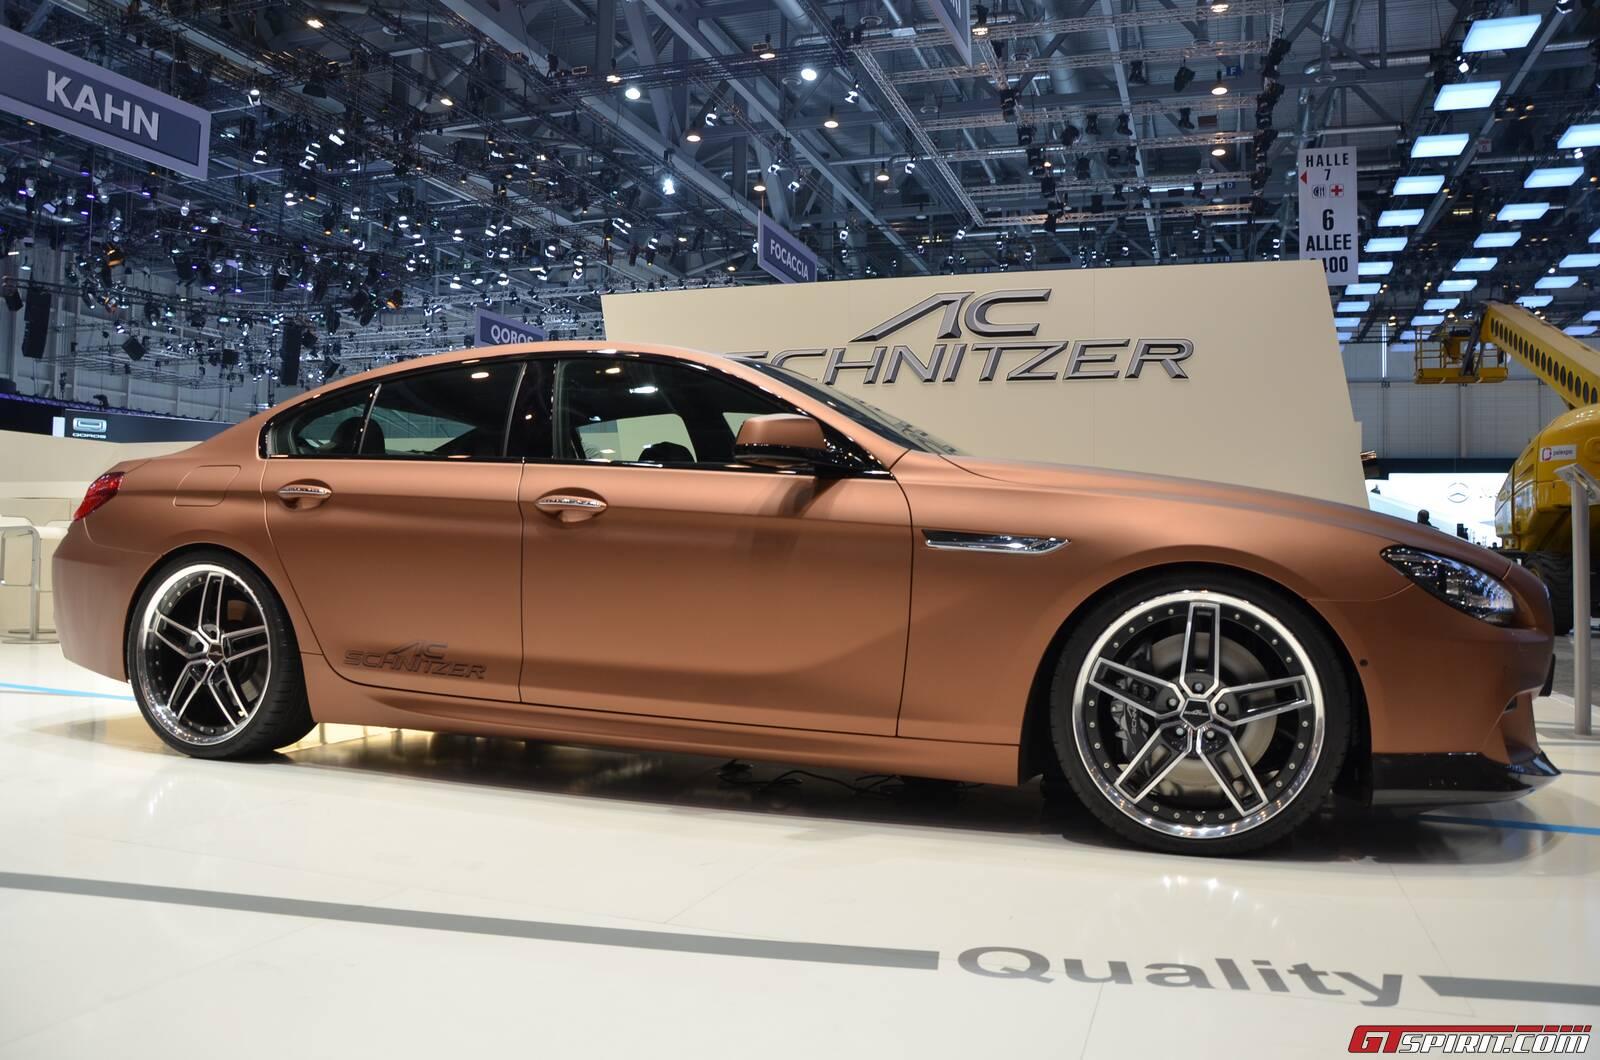 Schnitzer Home Design geneva 2013 ac schnitzer 640d gran coupé gtspirit